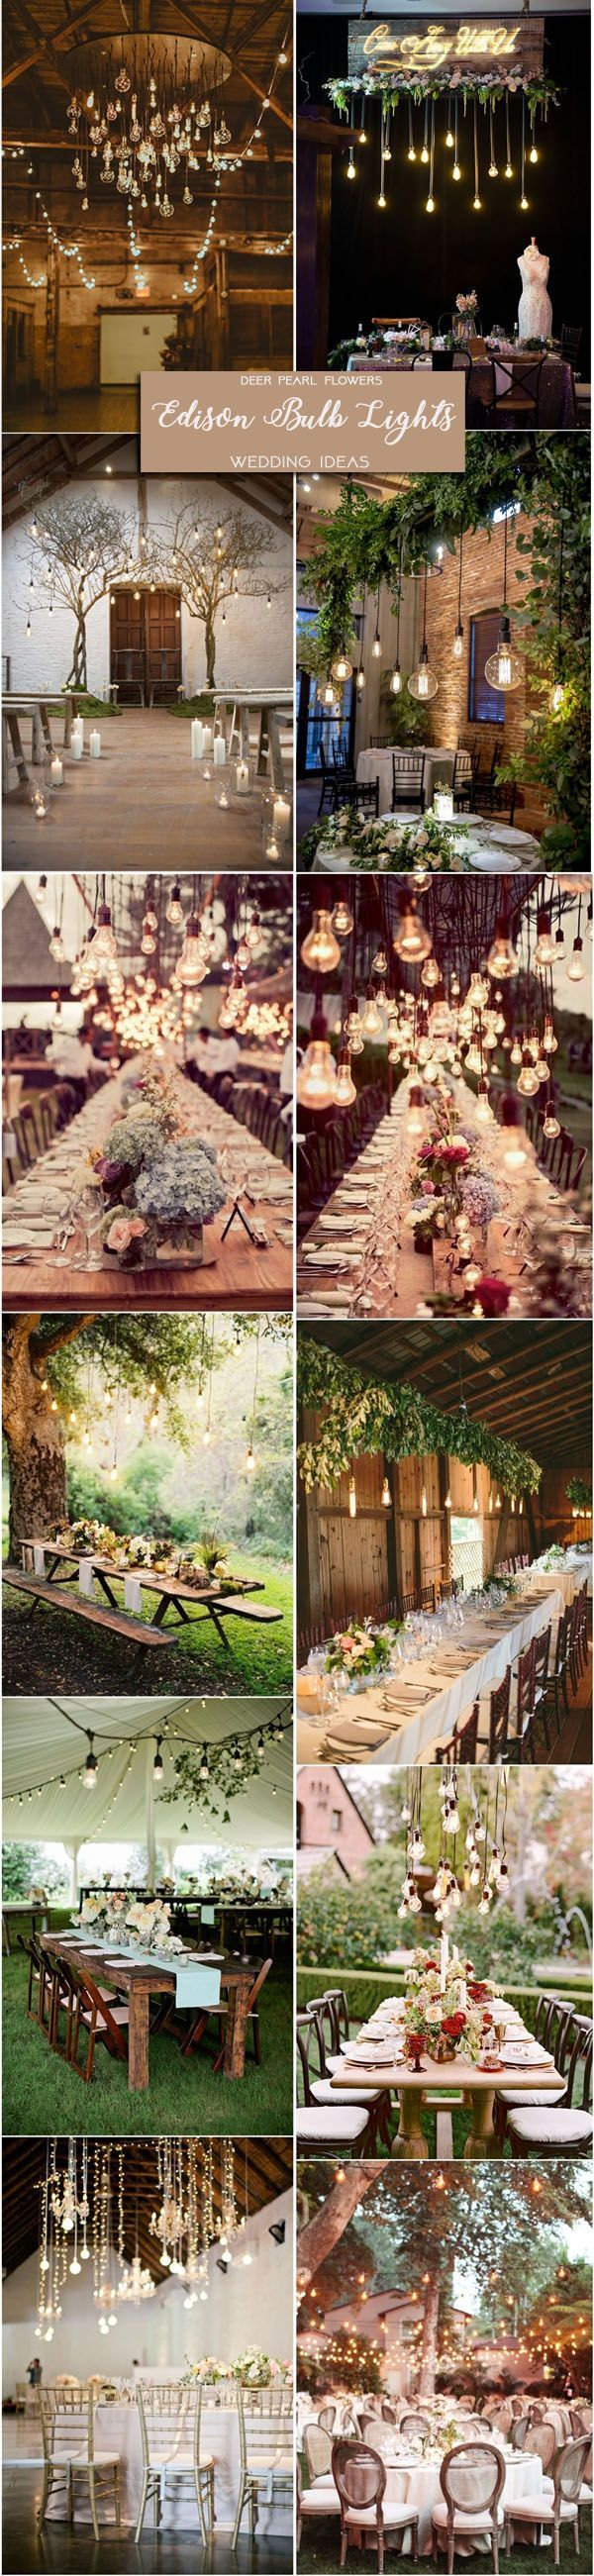 Top  Rustic Wedding Themes u Ideas for  Part II  Bulb lights